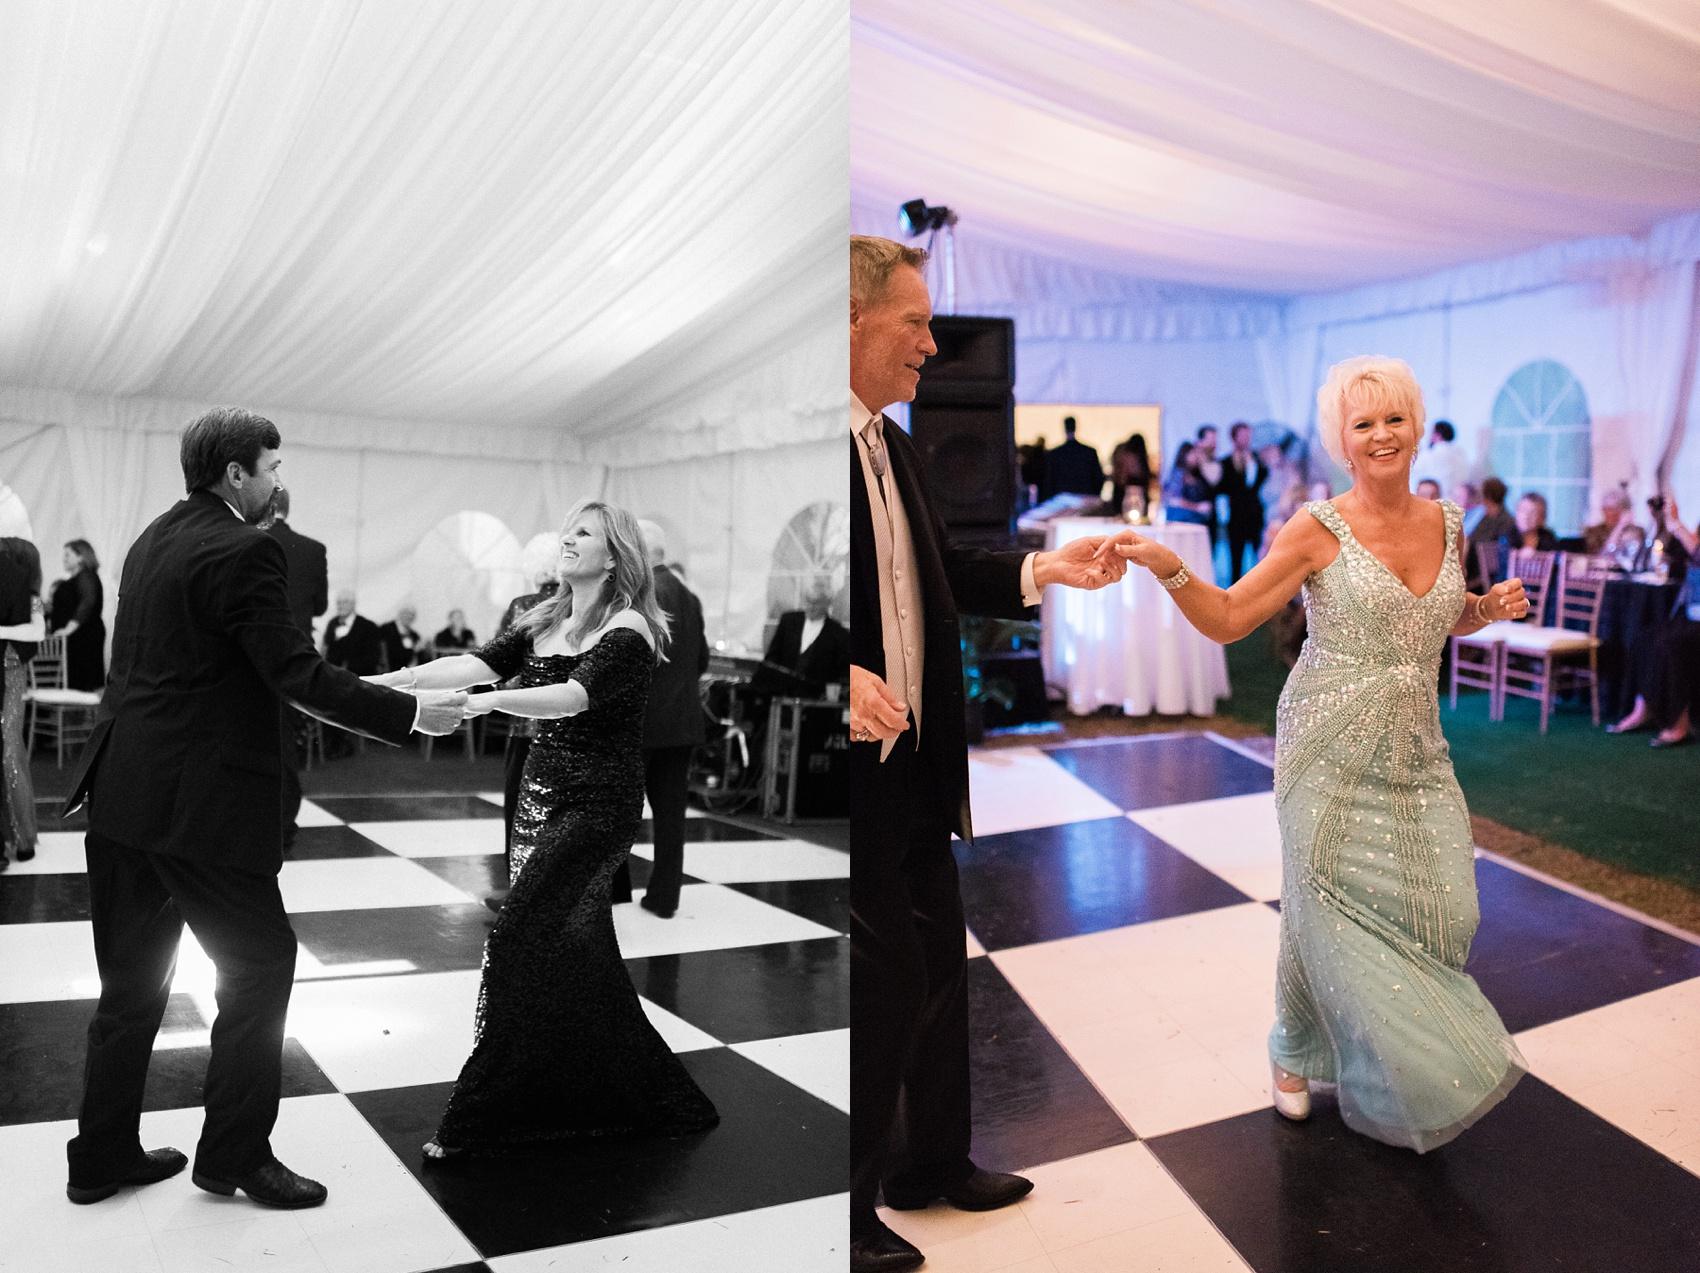 South_carolina_wedding_photographer_0112.jpg